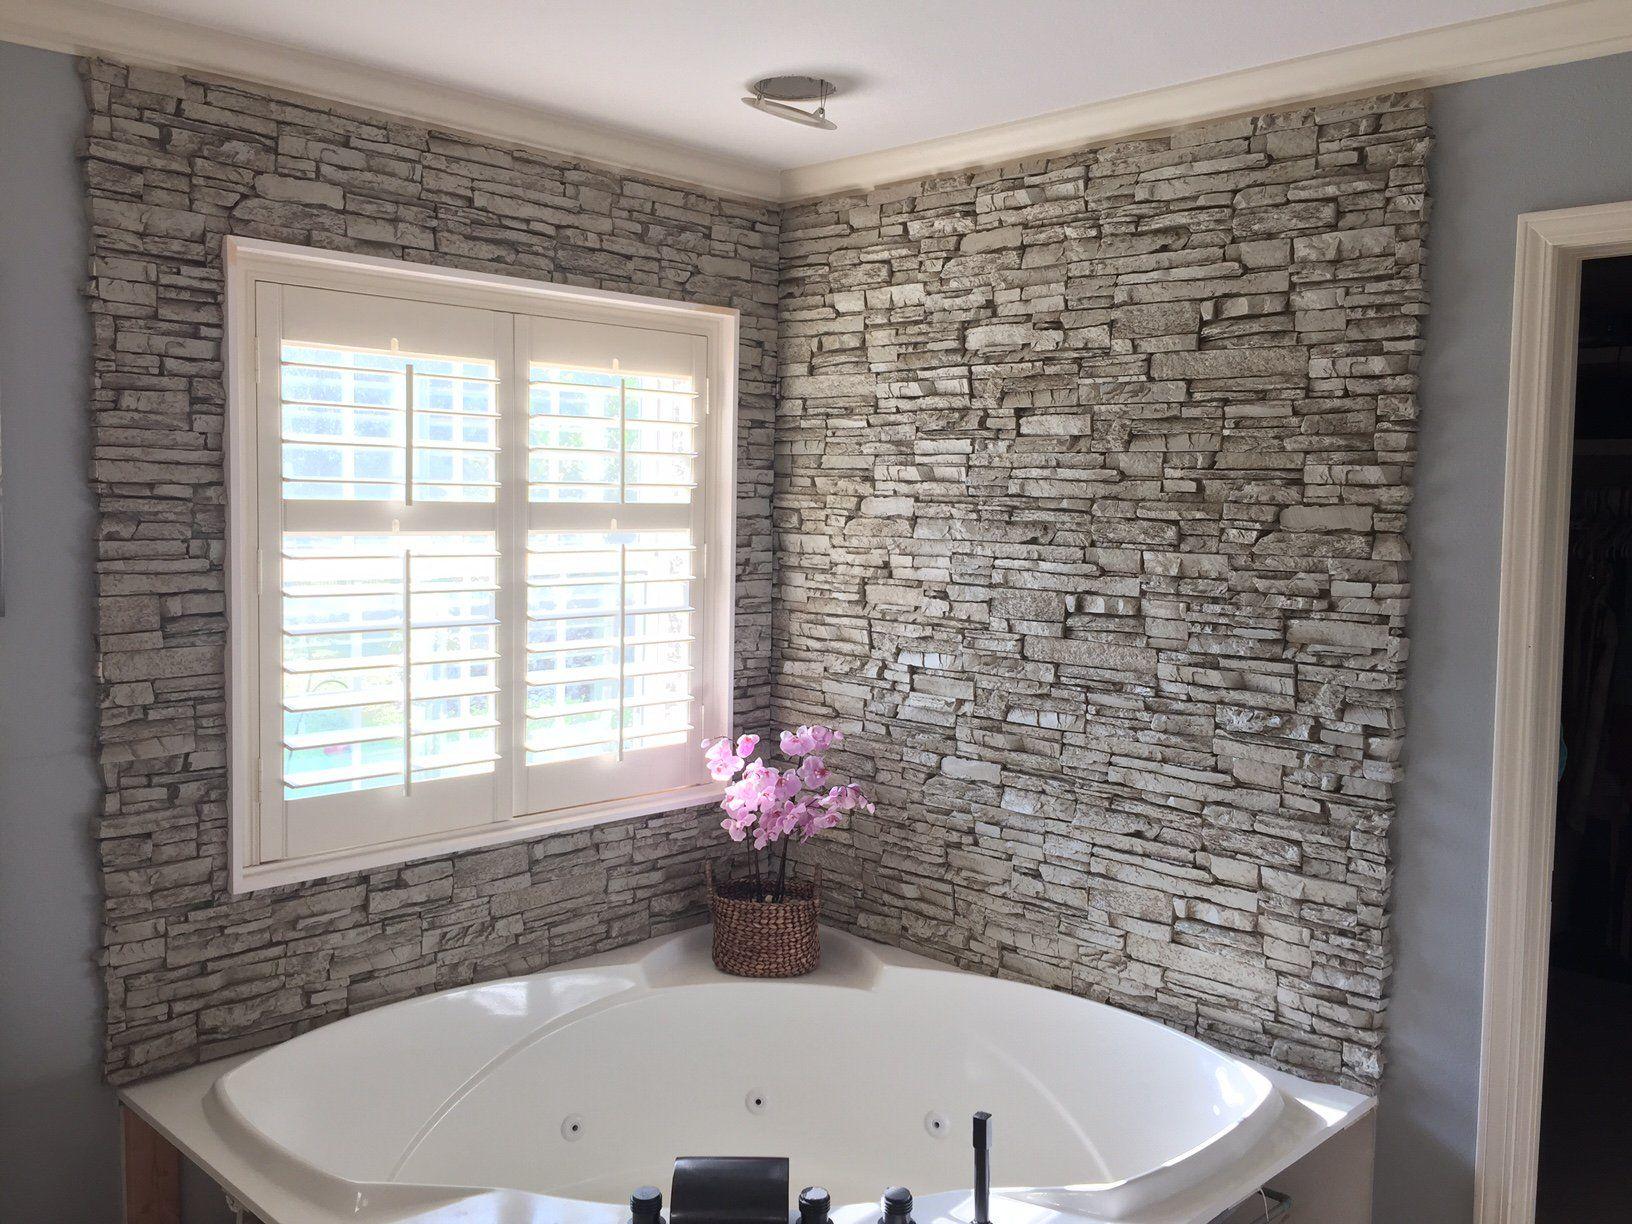 Stunning Corner Bathtub Wall Surround | Pinterest | Bathtub walls ...